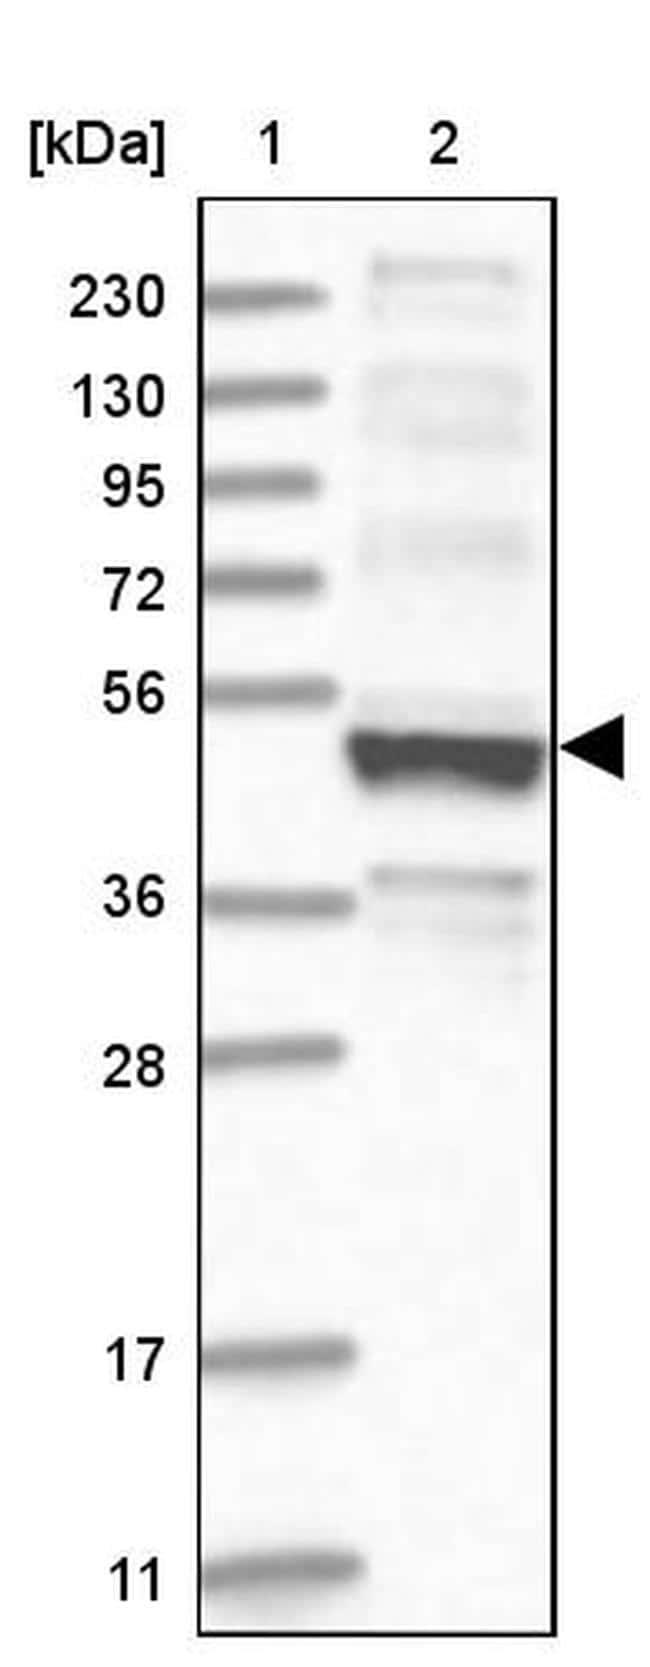 Kir6.1 (KCNJ8) Antibody in Western Blot (WB)